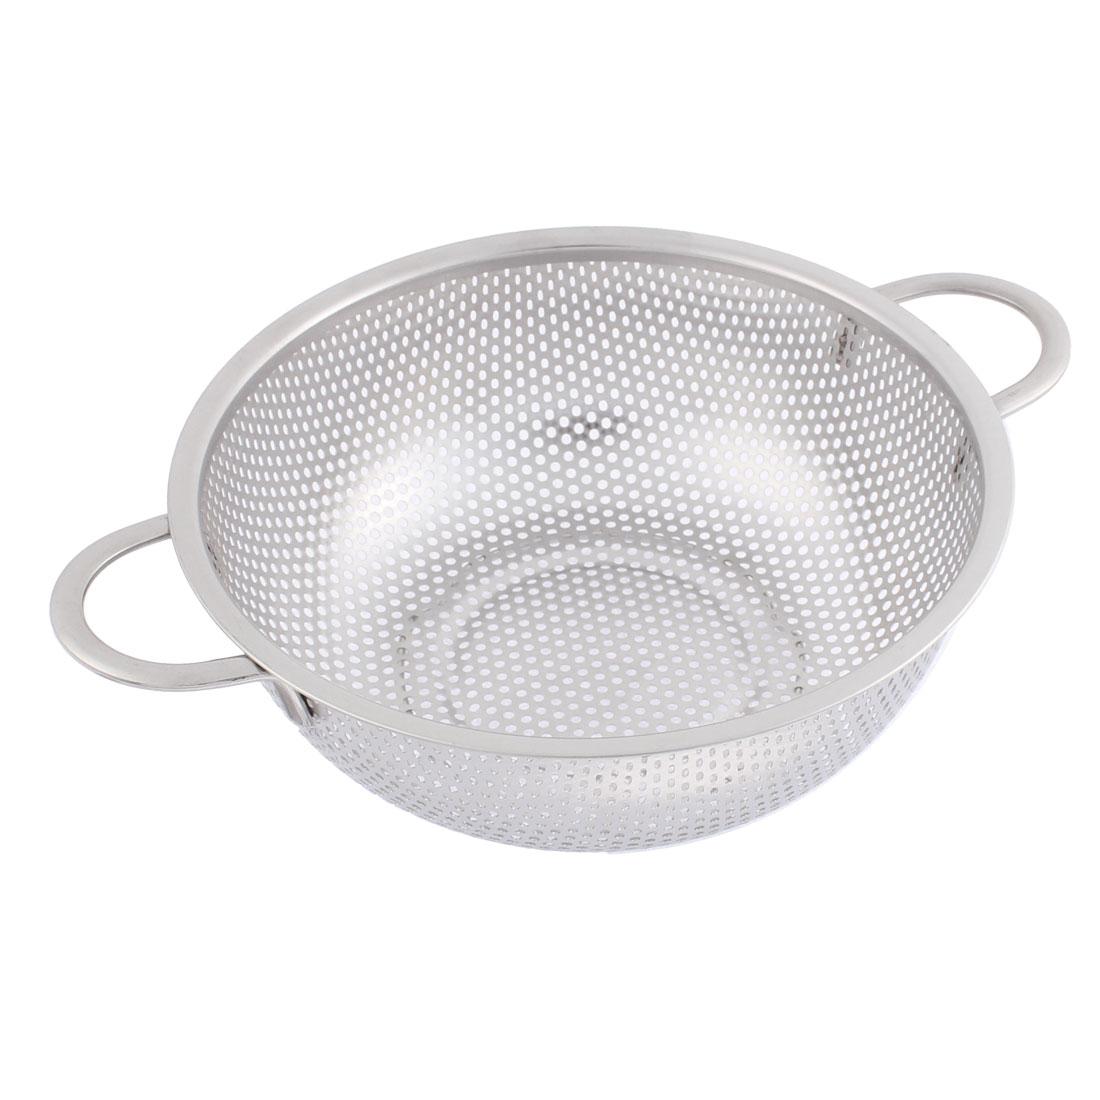 Kitchen Fruit Stainless Steel Basket Strainer 19.5cm Dia